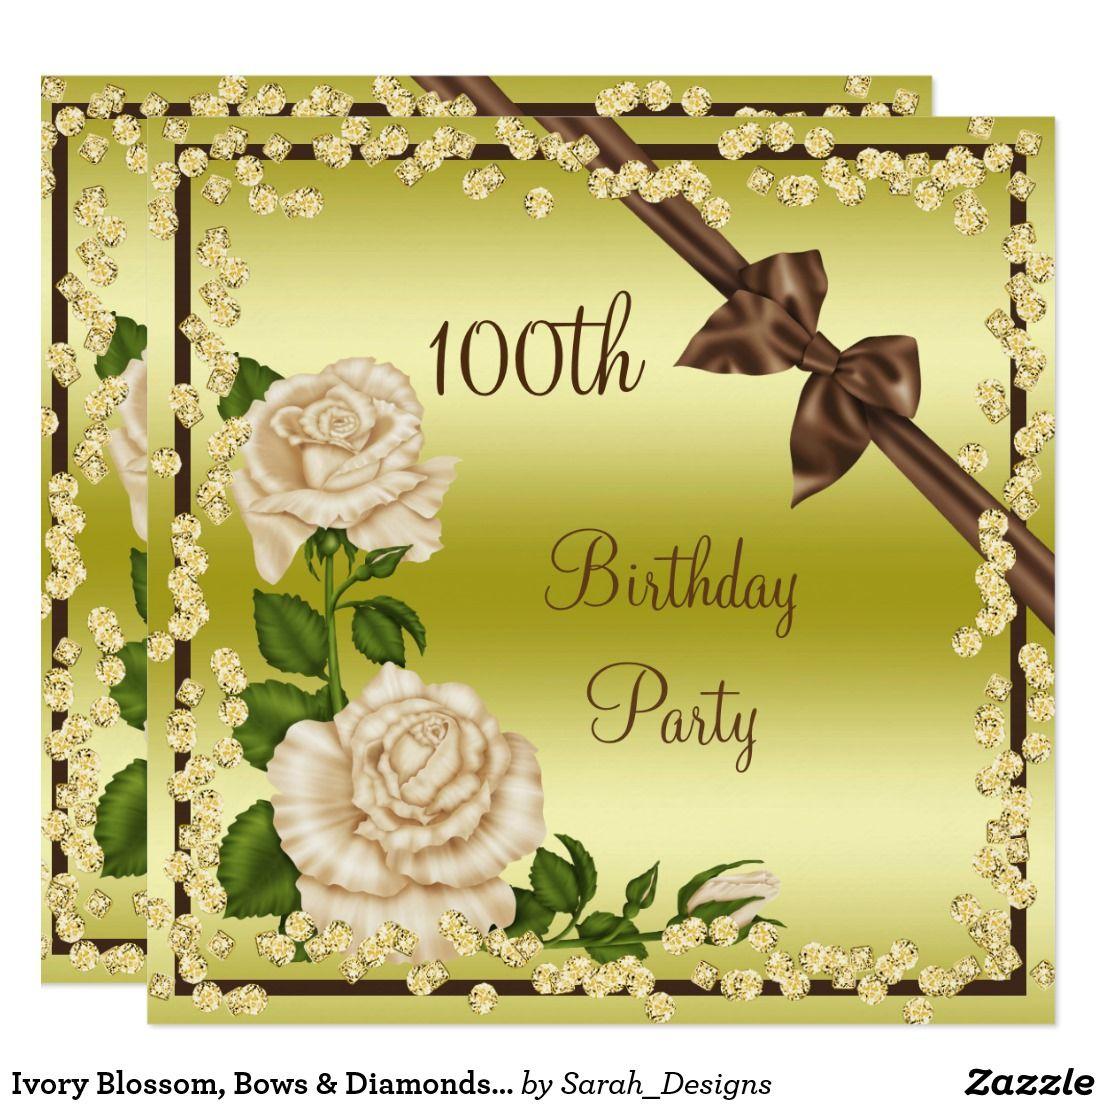 Ivory blossom bows diamonds 100th birthday card birthdays and ivory blossom bows diamonds 100th birthday card beautiful custom 100th birthday party invitation for women elegant glamorous and sophisticated custom filmwisefo Choice Image